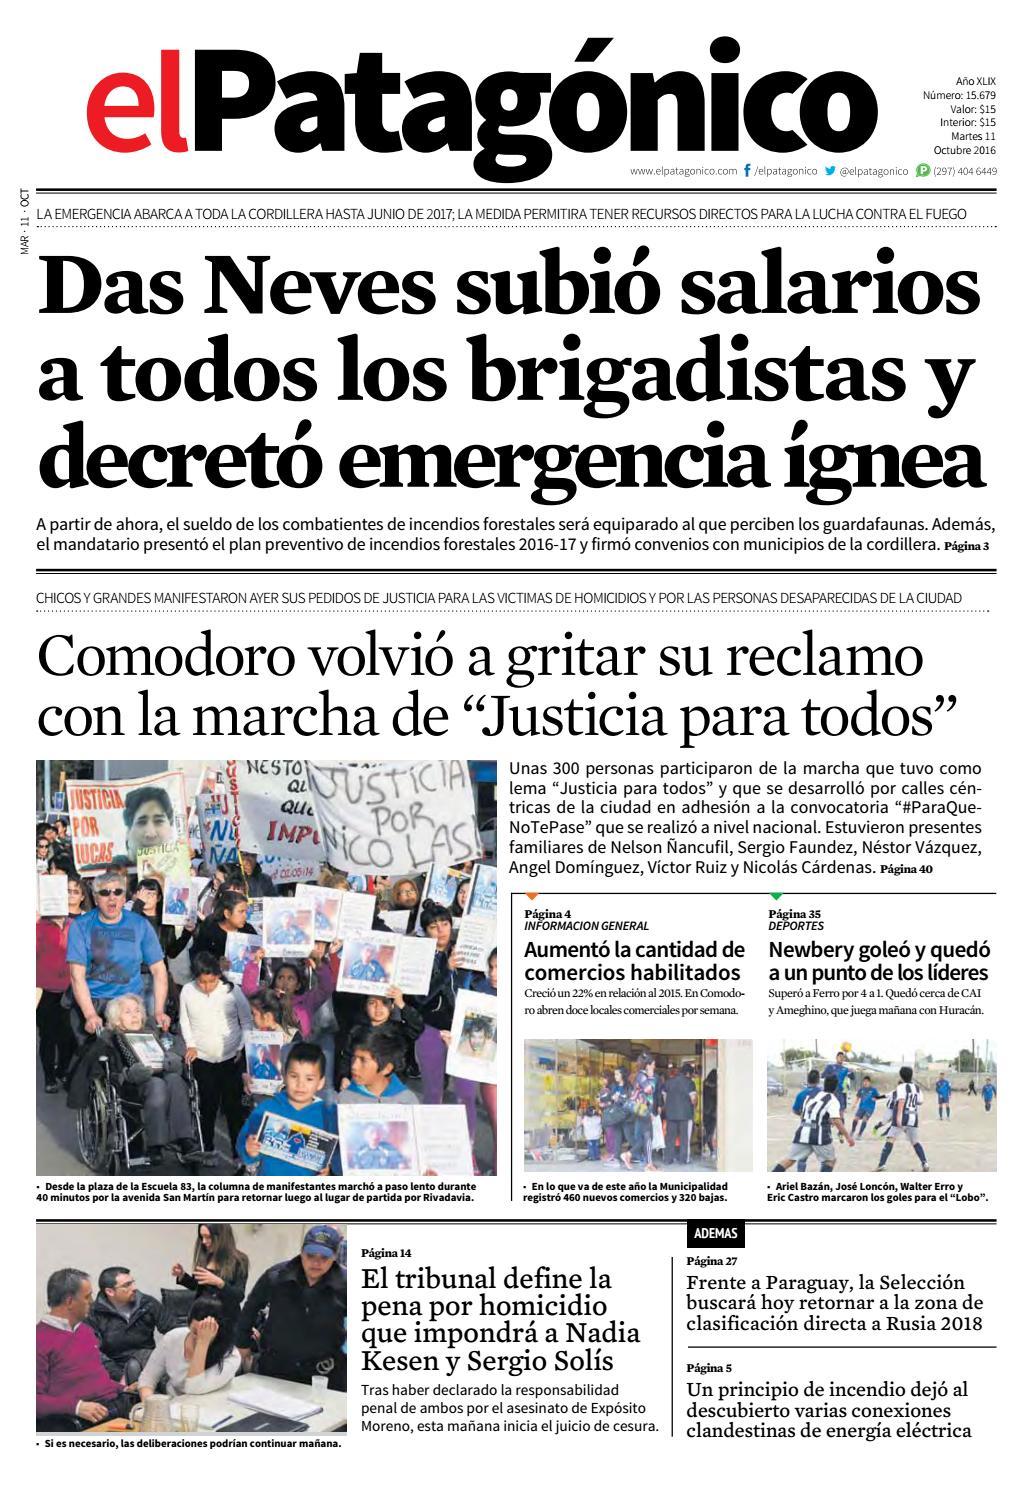 edicion230210102016.pdf by El Patagonico - issuu